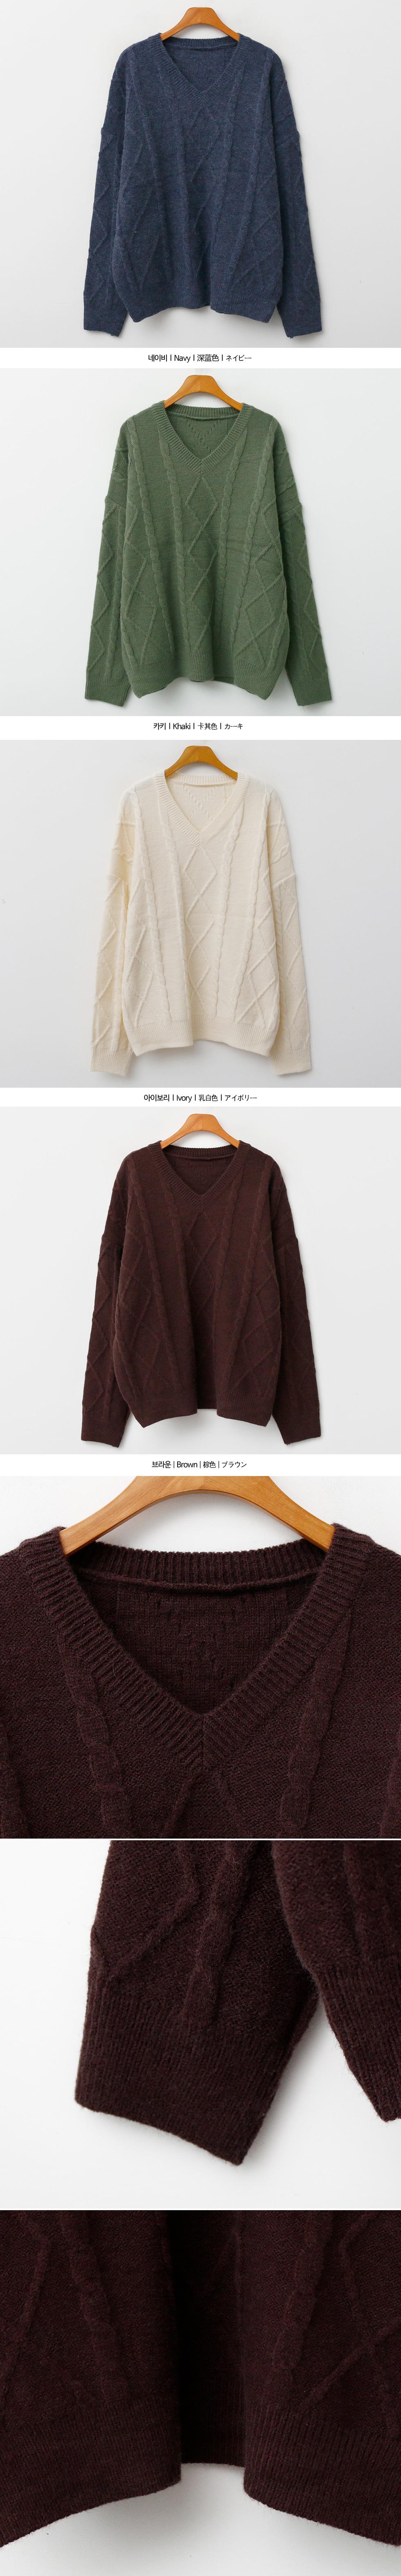 Emotional Fisher V Knitwear